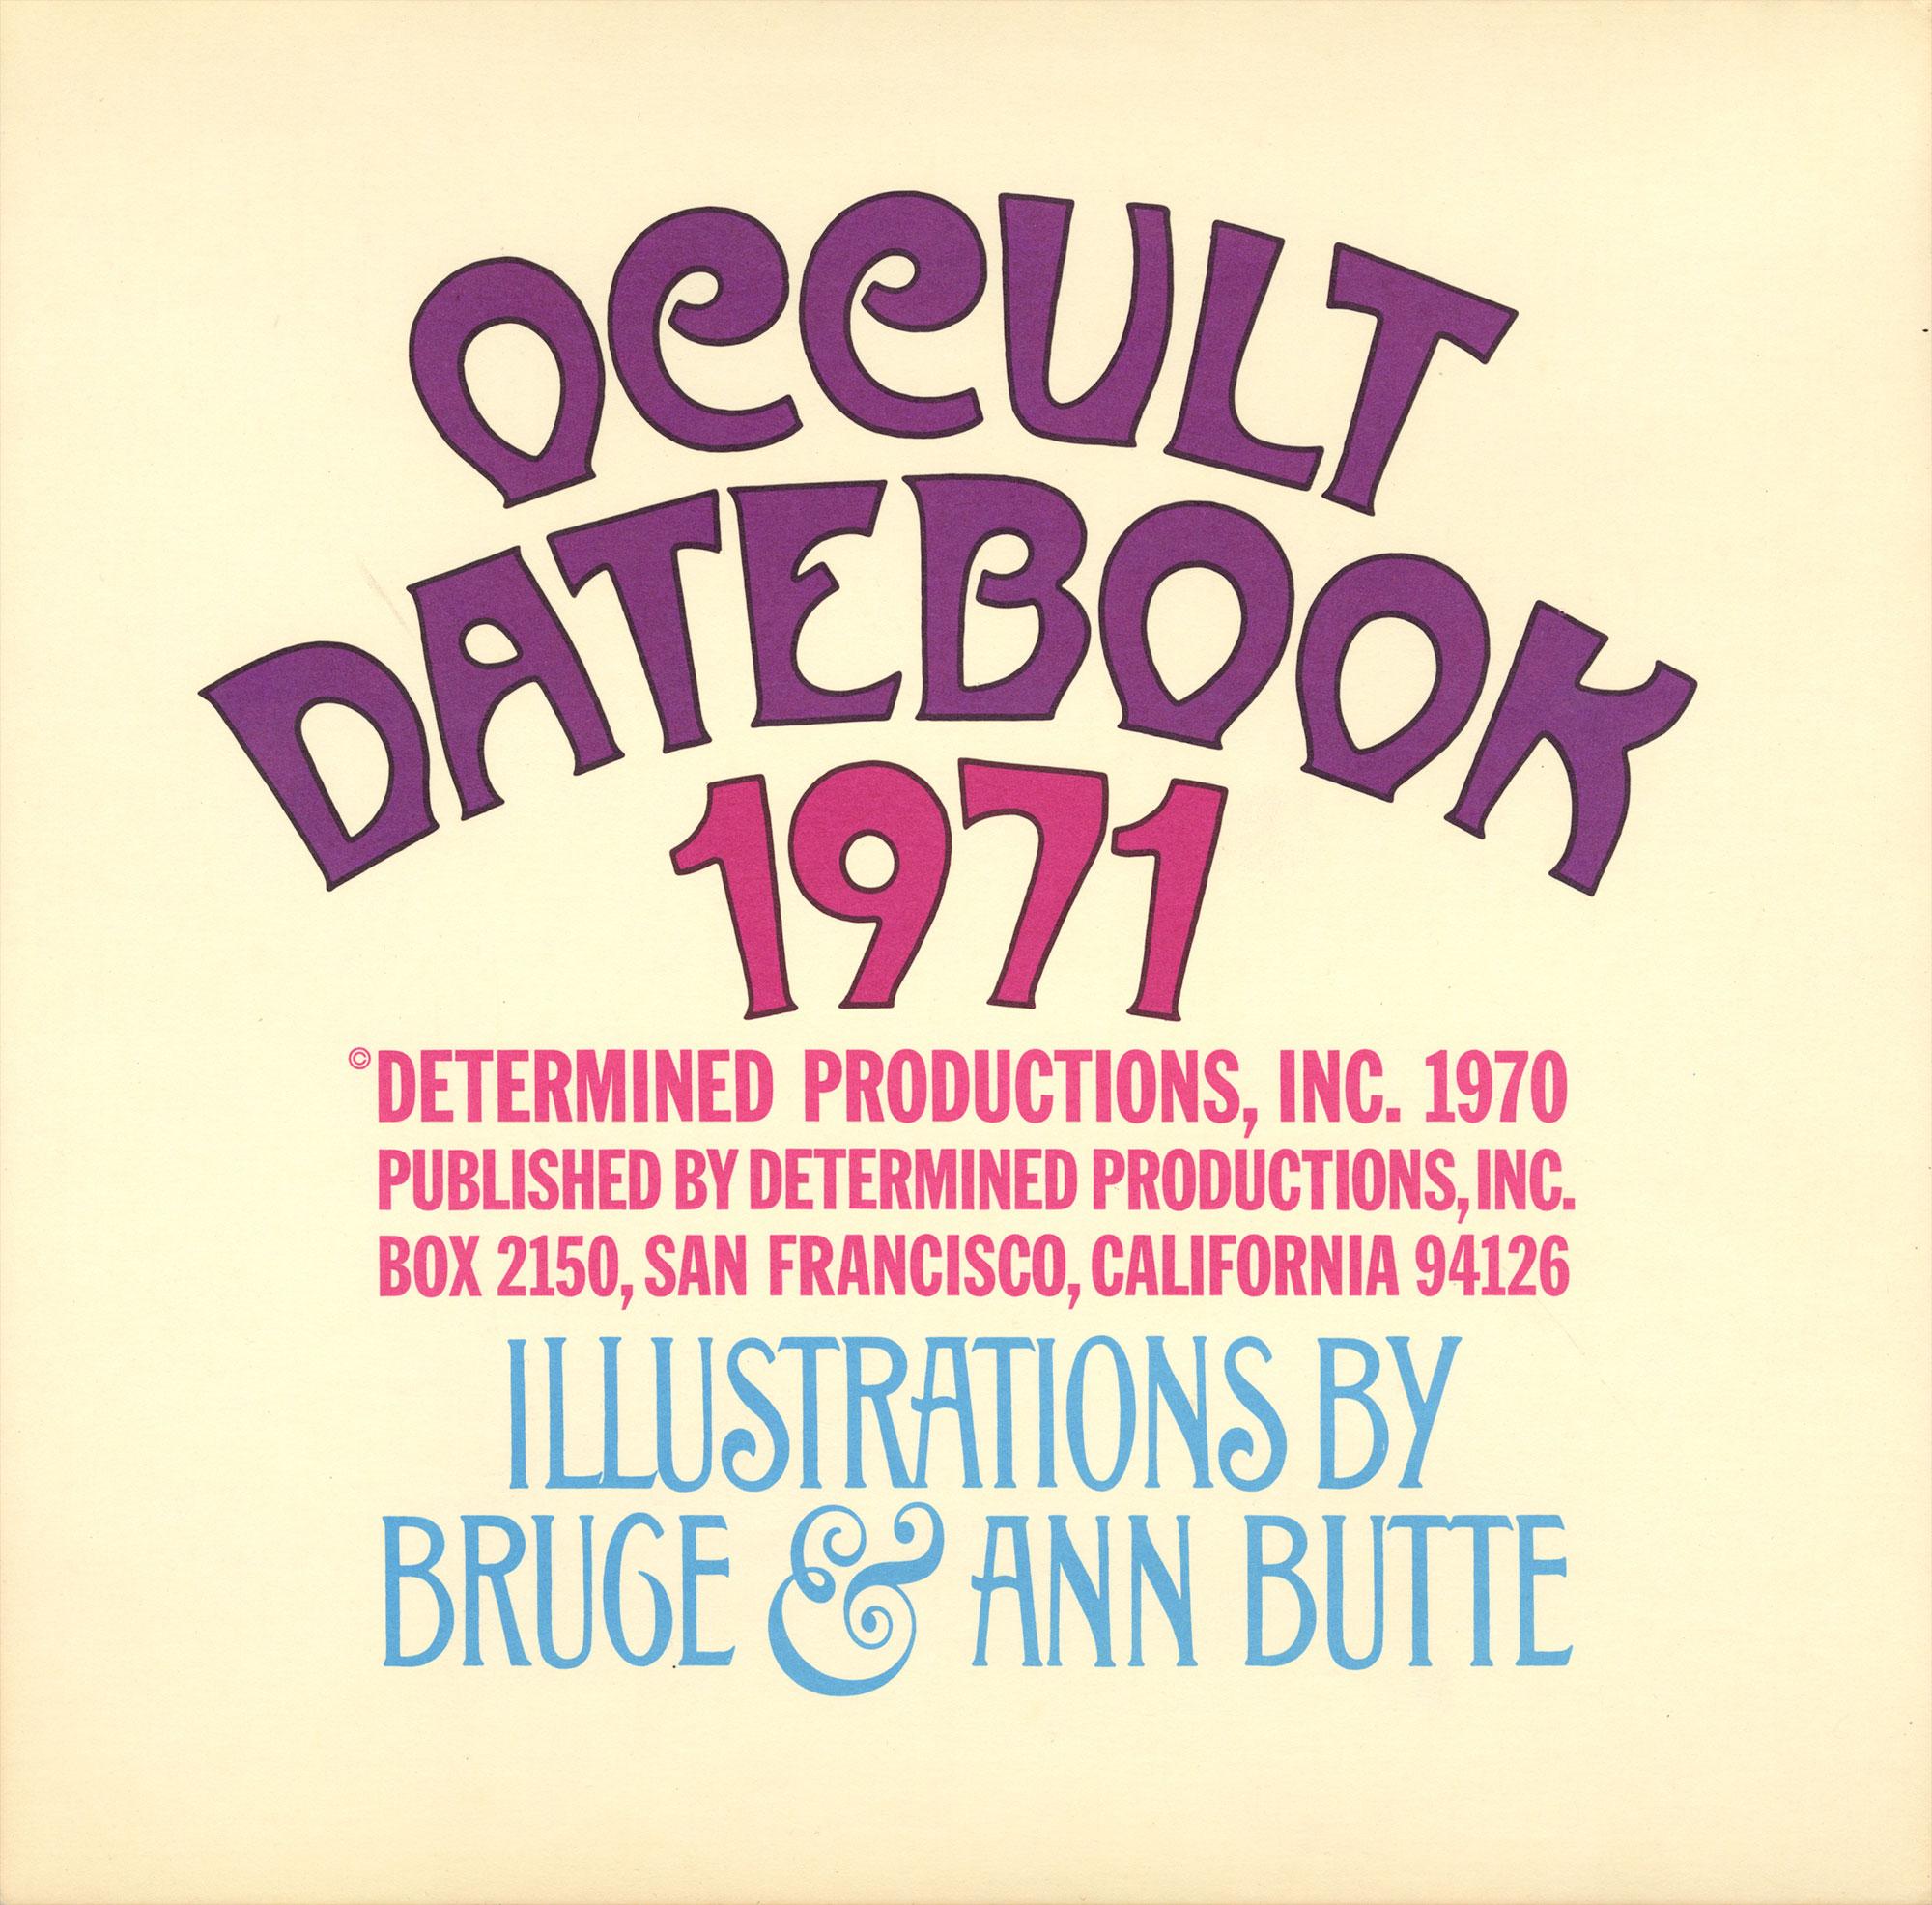 occult-datebook-i.jpg